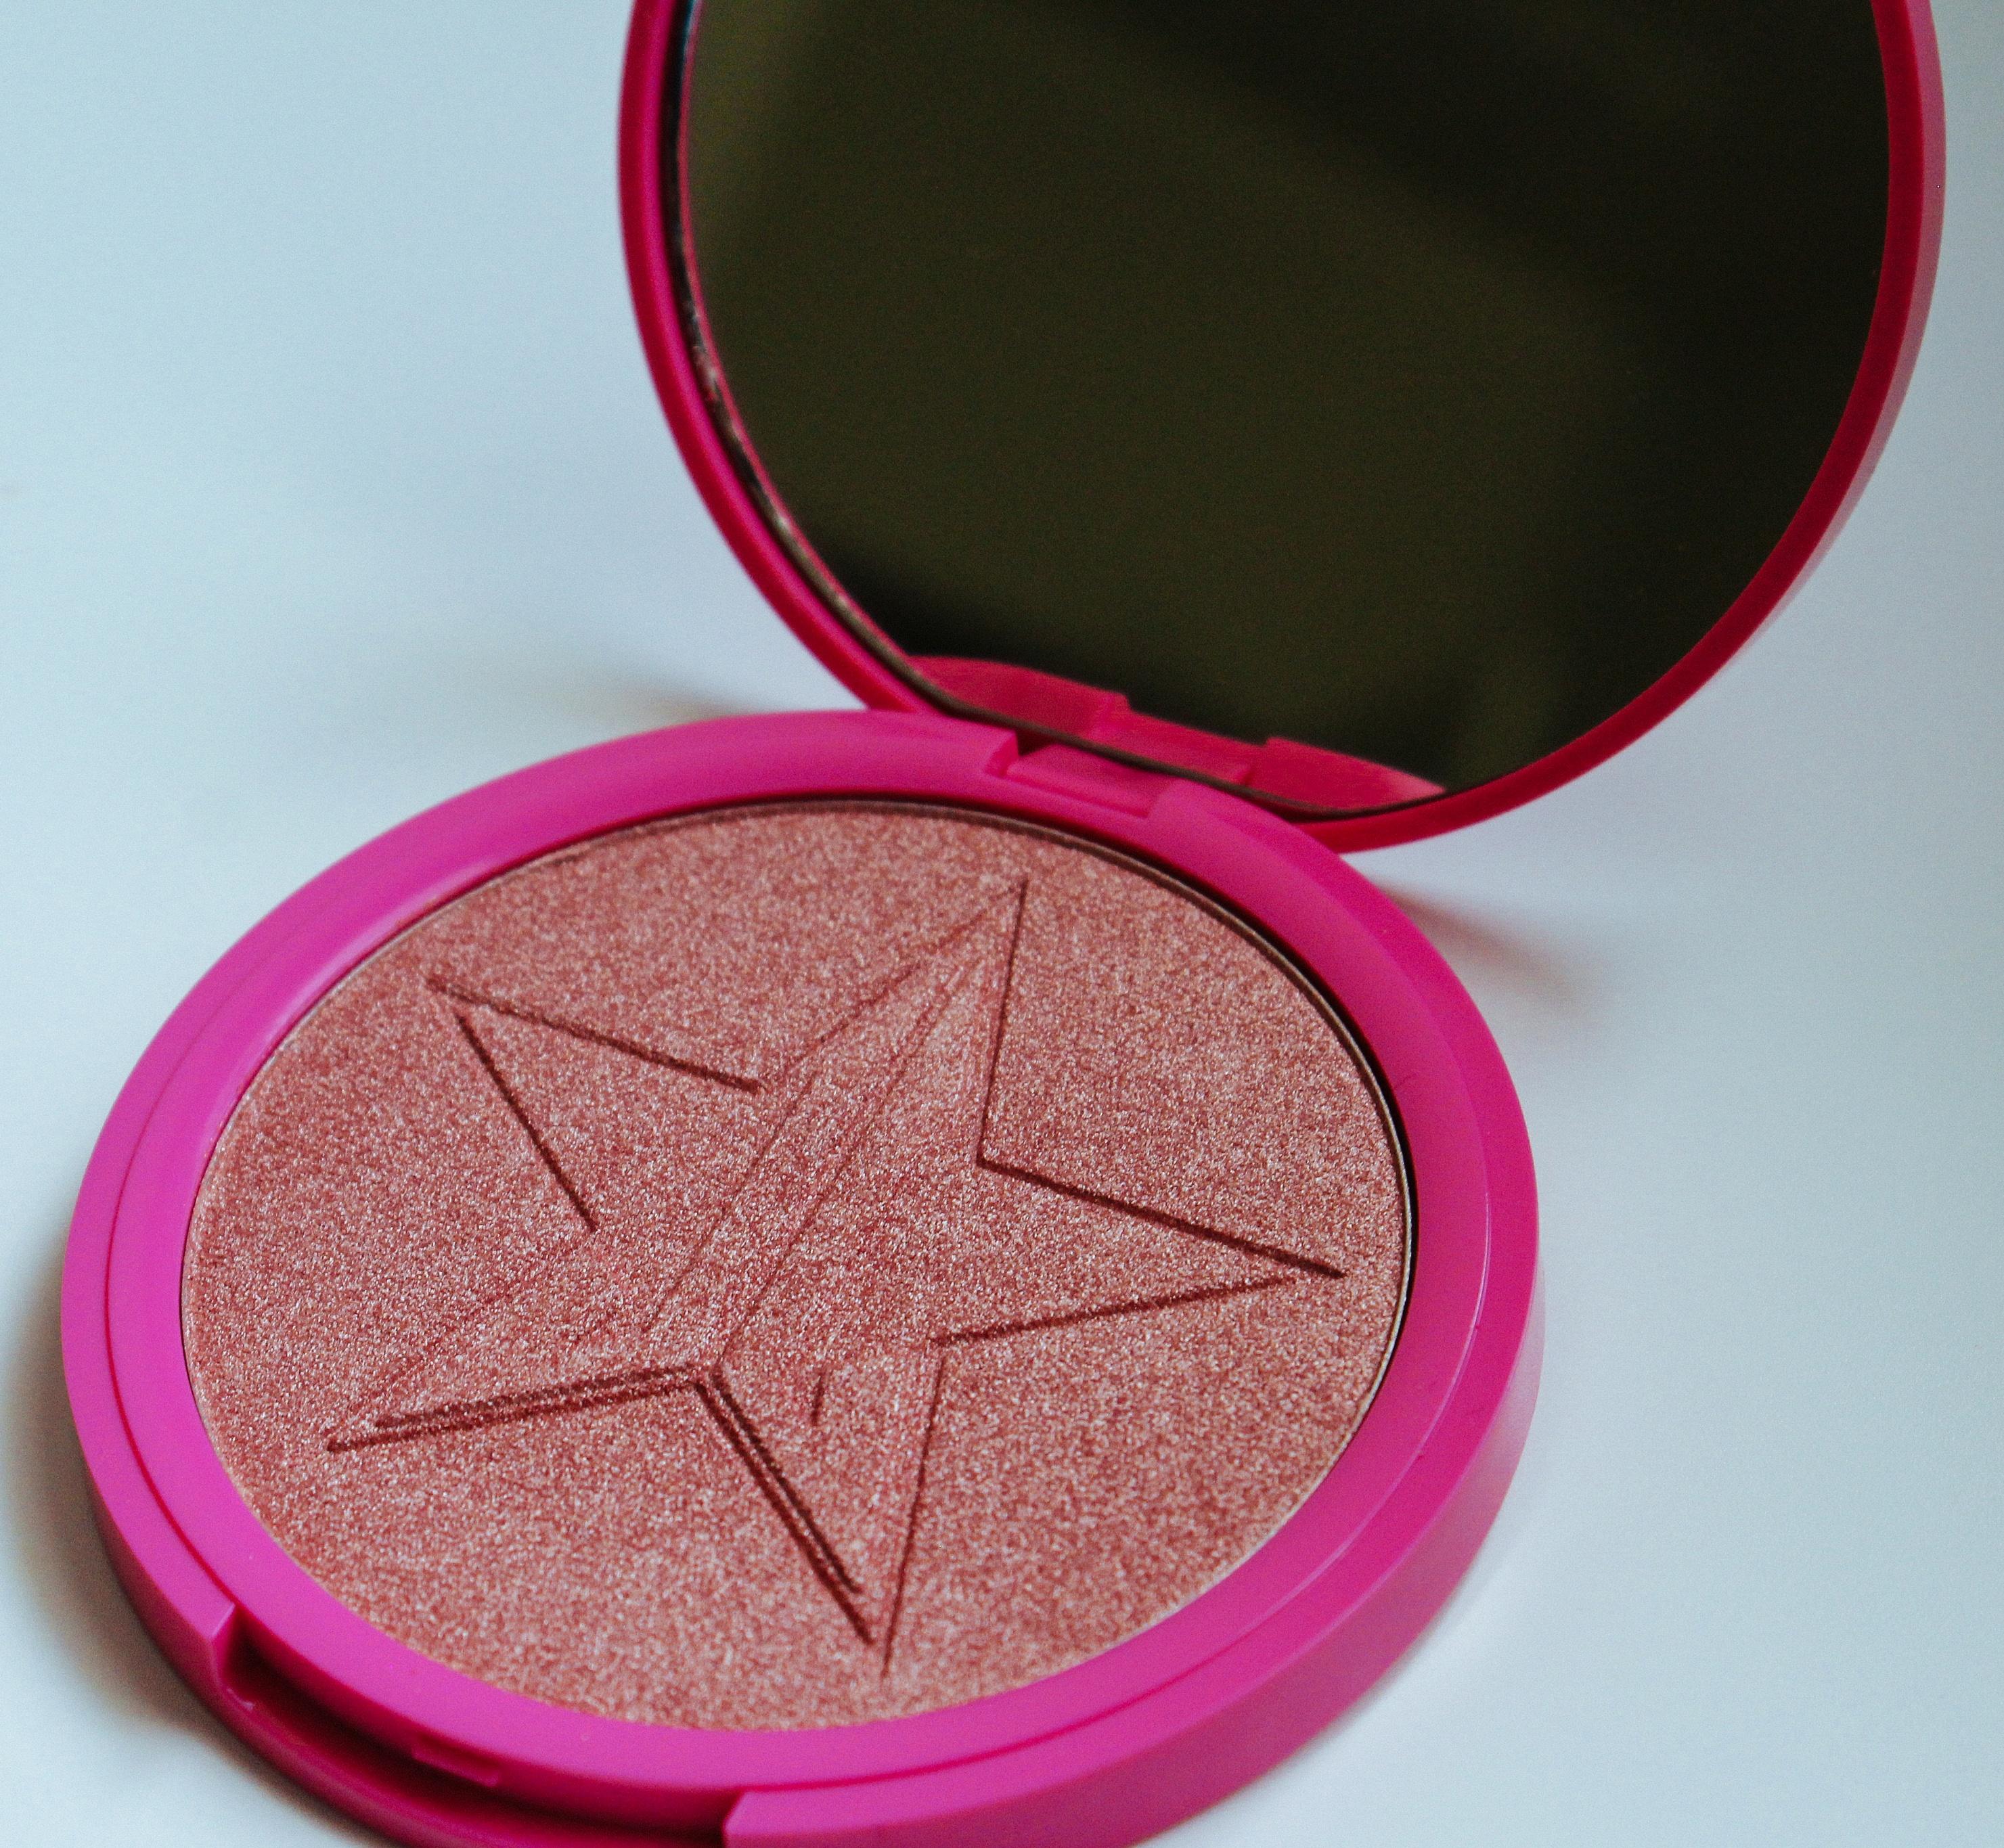 Jeffree Star Cosmetics Skin Frost Highlight On Fleek Cruelty-Free Vegan Cosmetics Jeffree Star Peach Goddess Highlighter